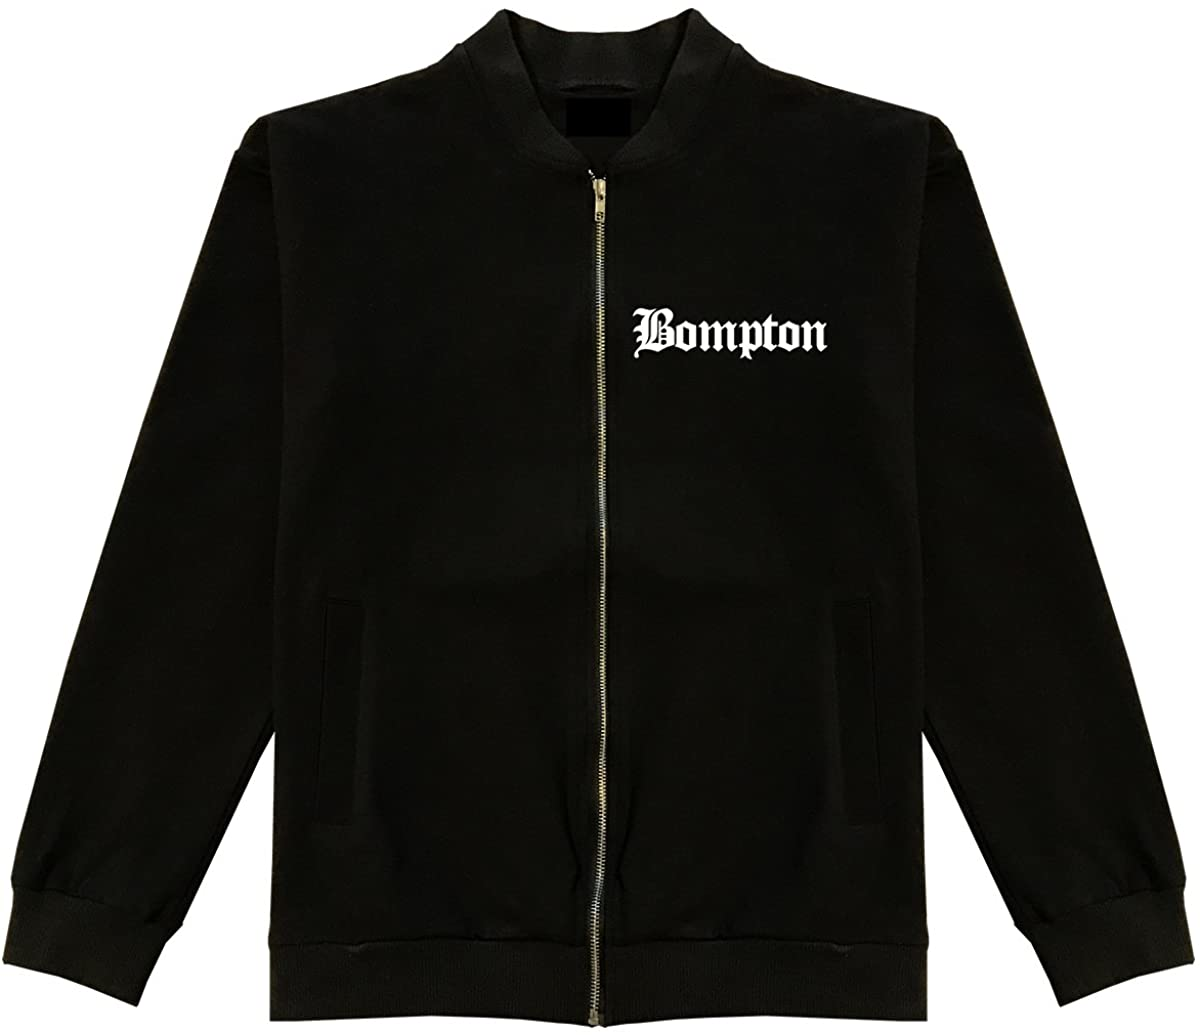 Kings Of NY Bompton Blood Cotton Bomber Jacket